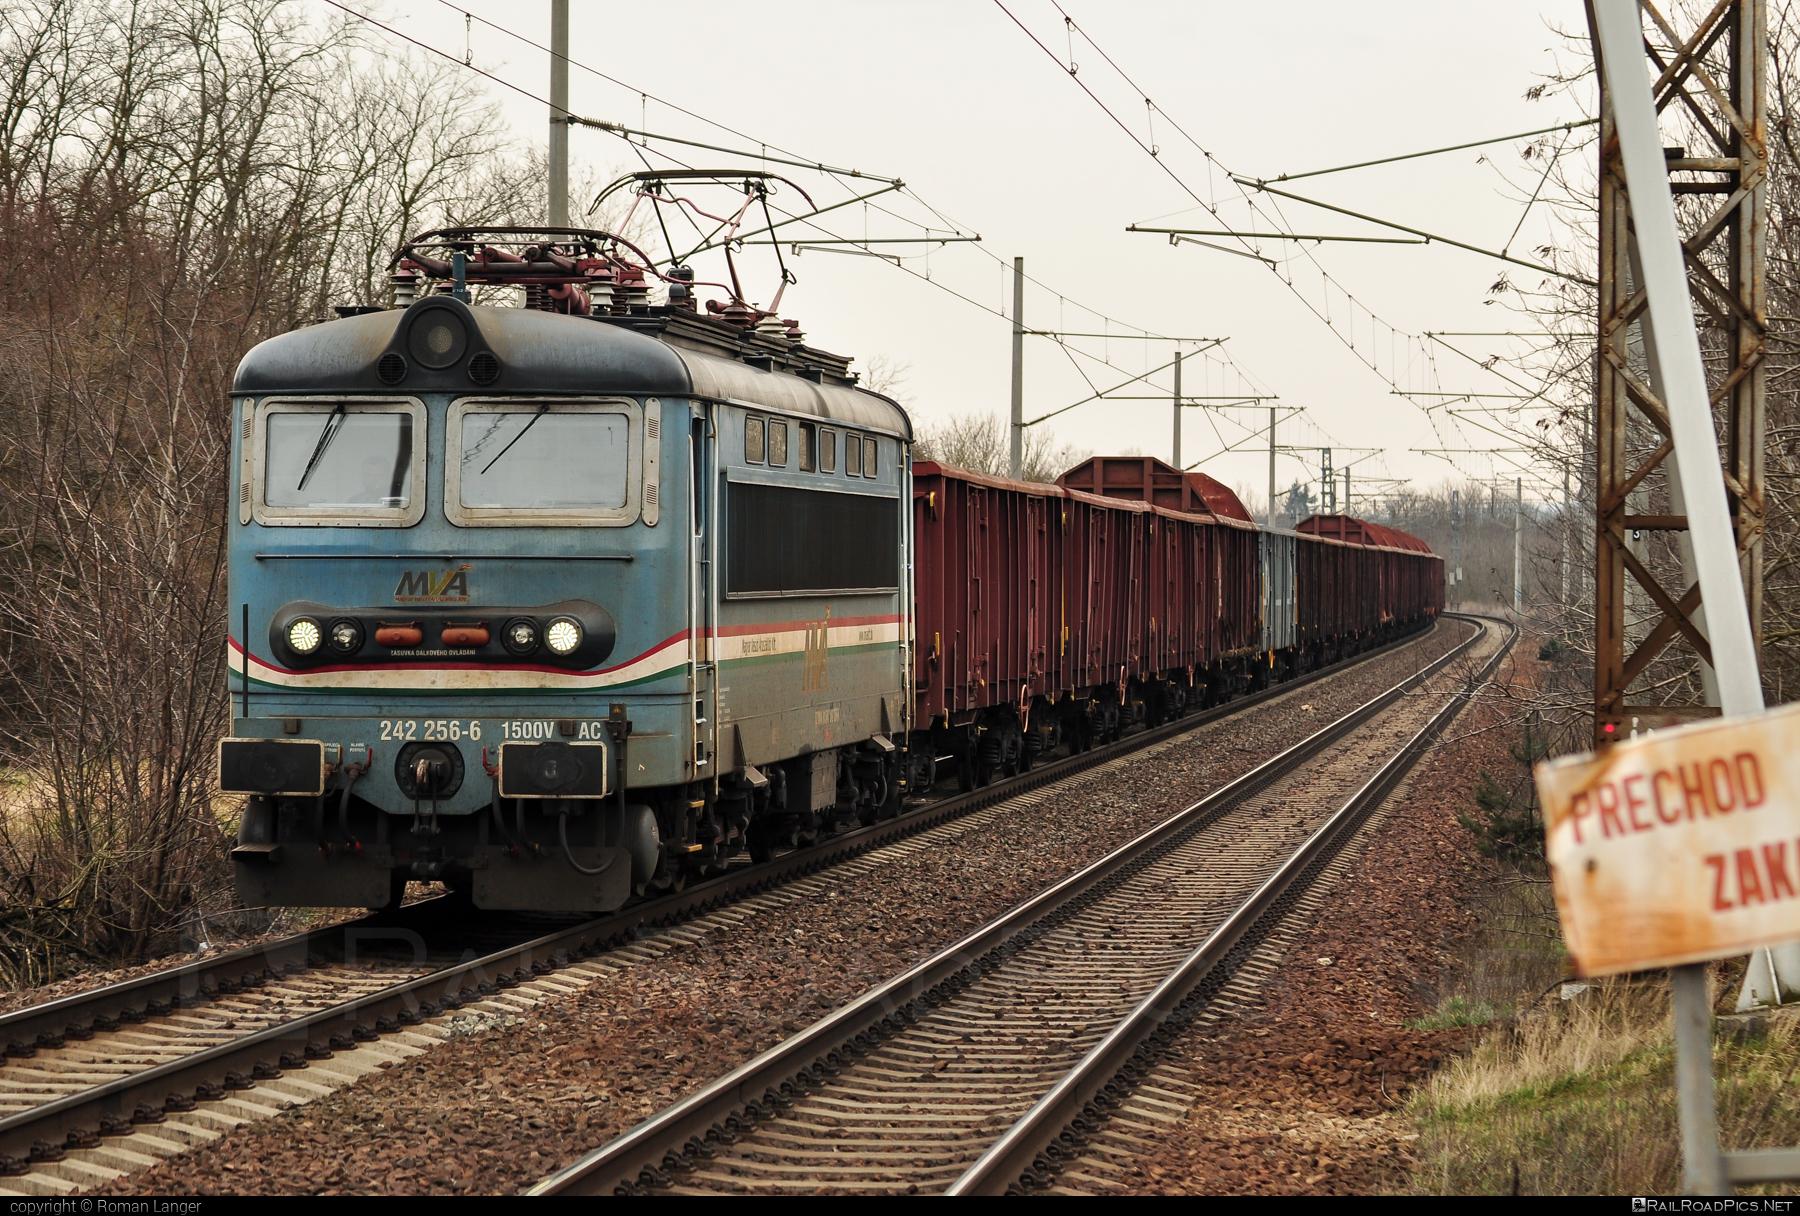 Škoda 73E - 242 256-6 operated by Magyar Vasúti Árúszállító Kft. #locomotive242 #magyarvasutiaruszallito #mva #plechac #skoda #skoda73e